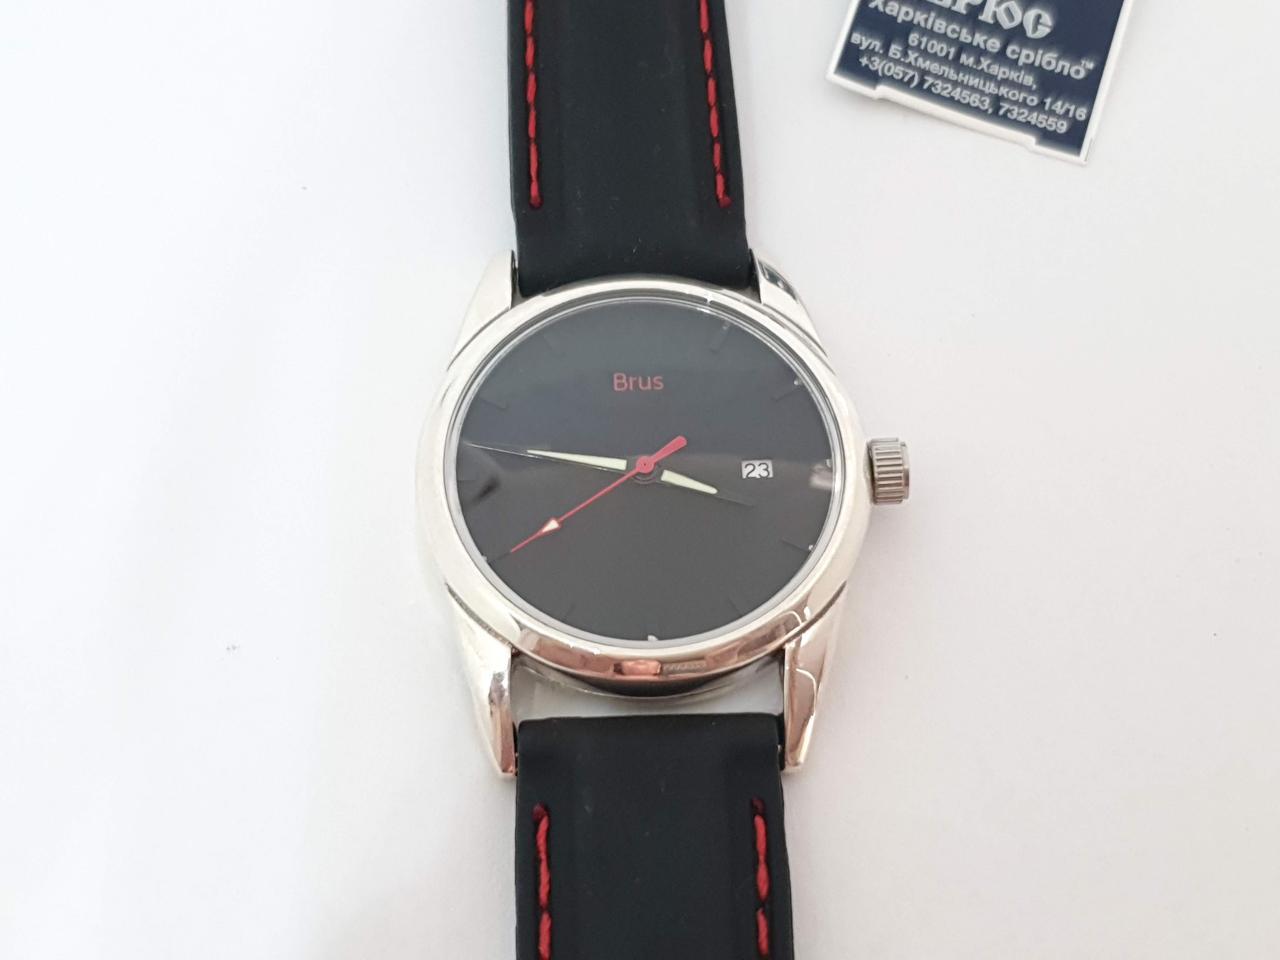 Серебряные часы. Артикул 7100059